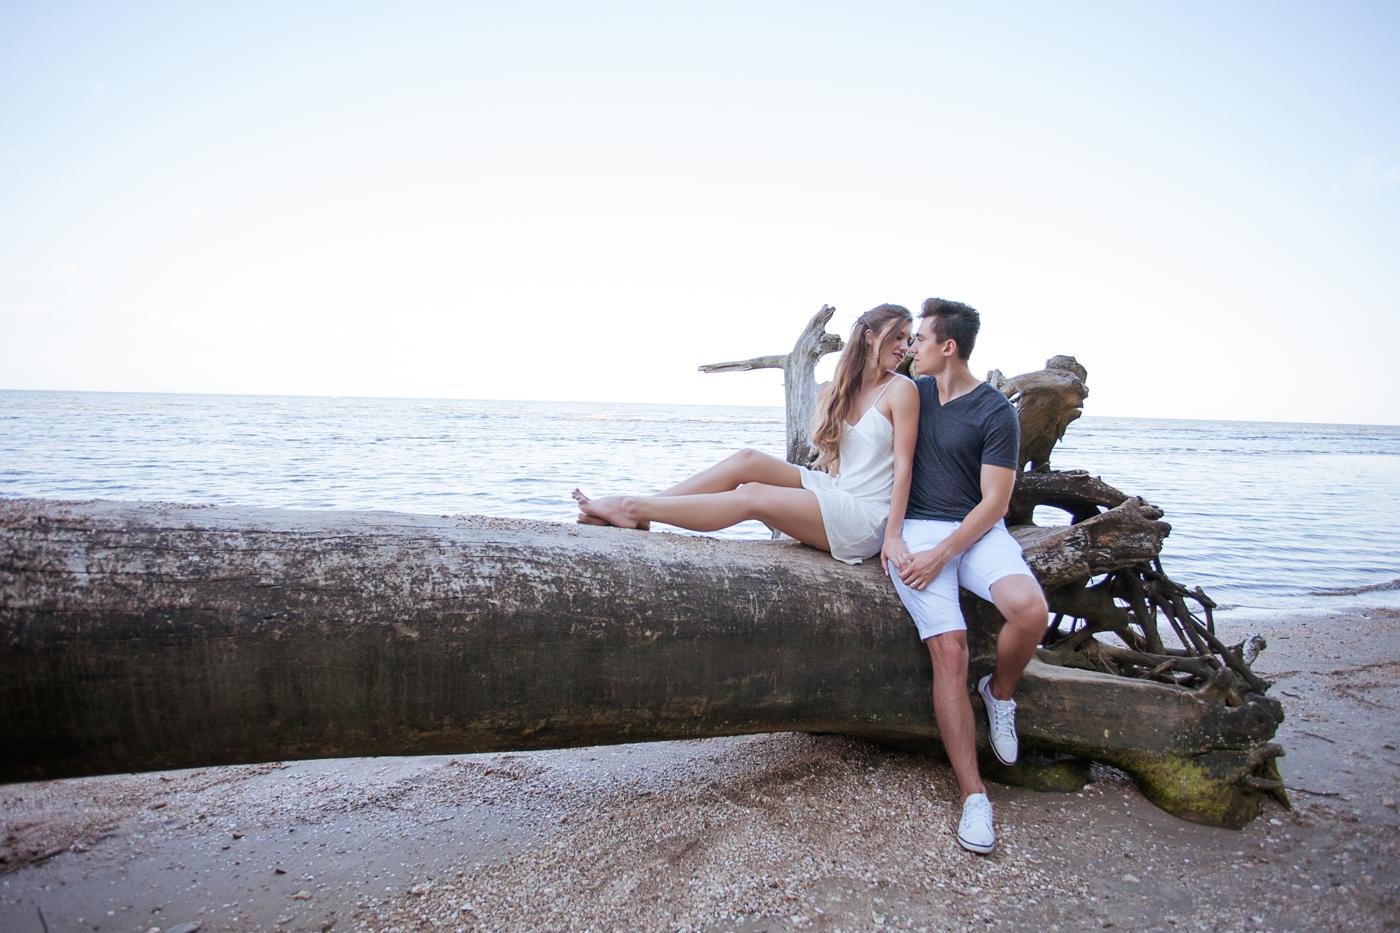 summer-beach-engagement-shoot-ksenia-pro-photography-53